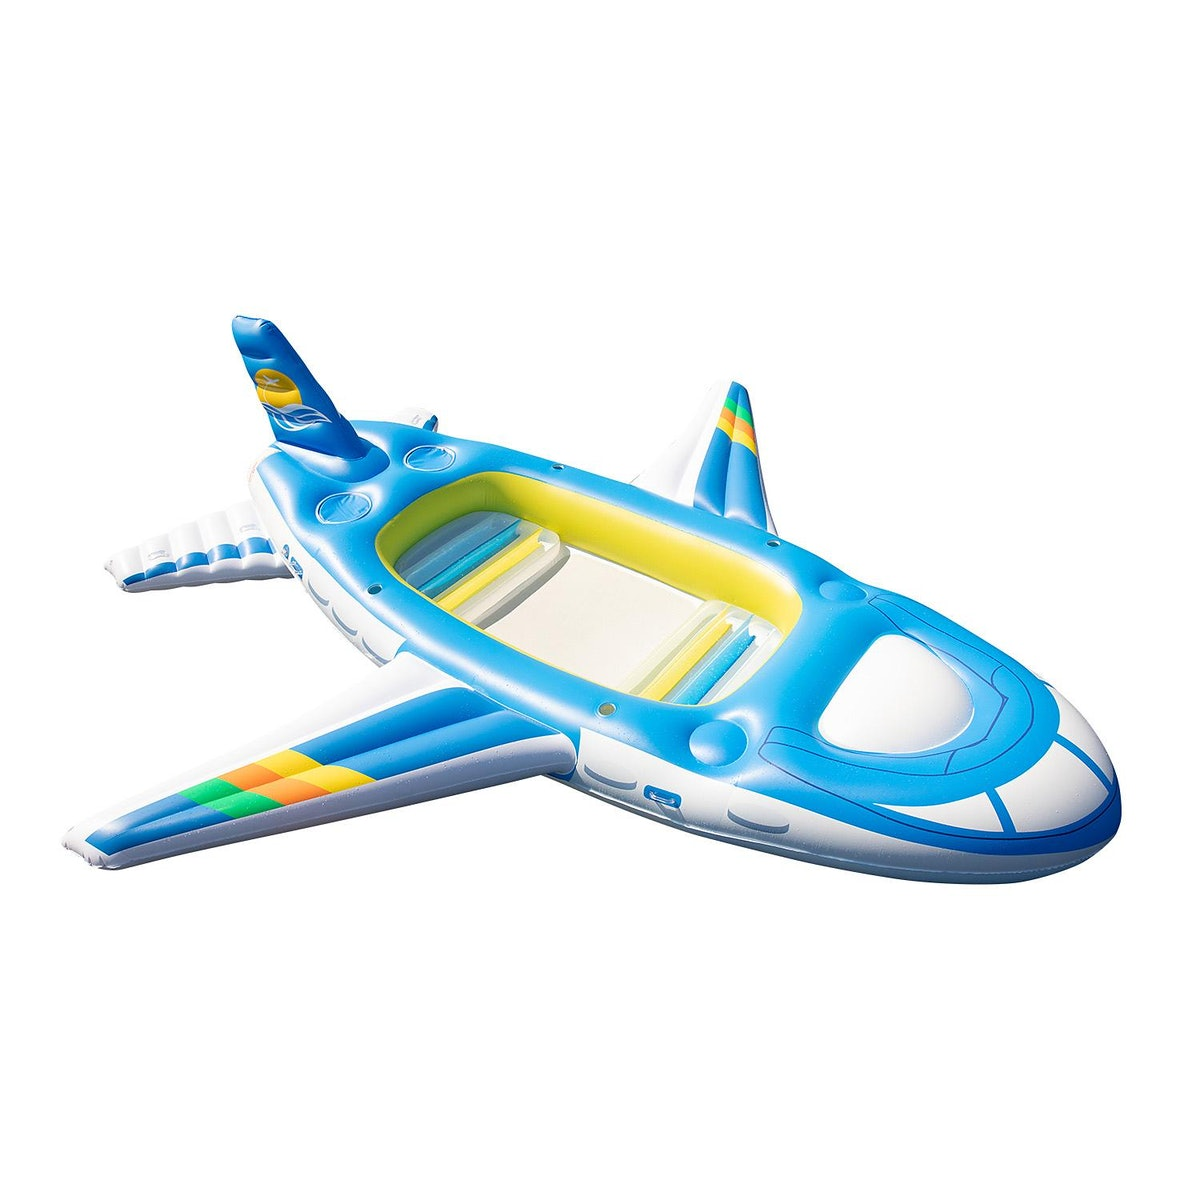 Member's Mark Island - Airplane